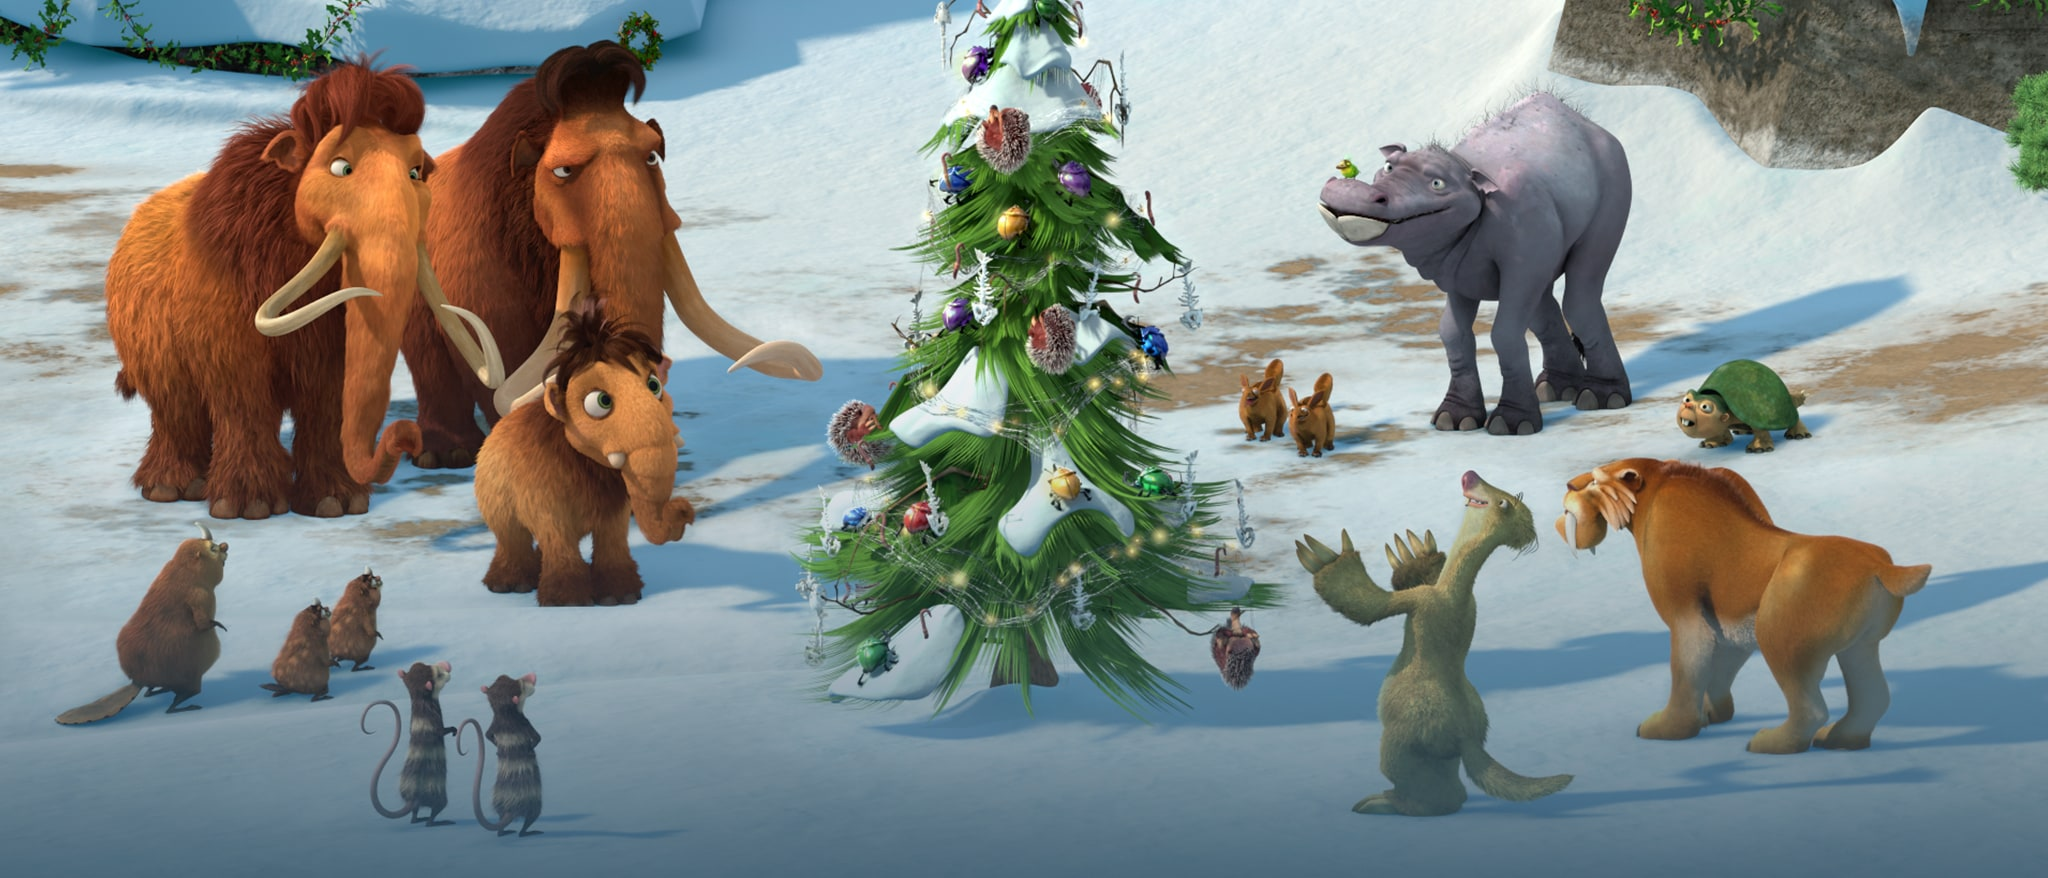 Ice Age: A Mammoth Christmas Hero